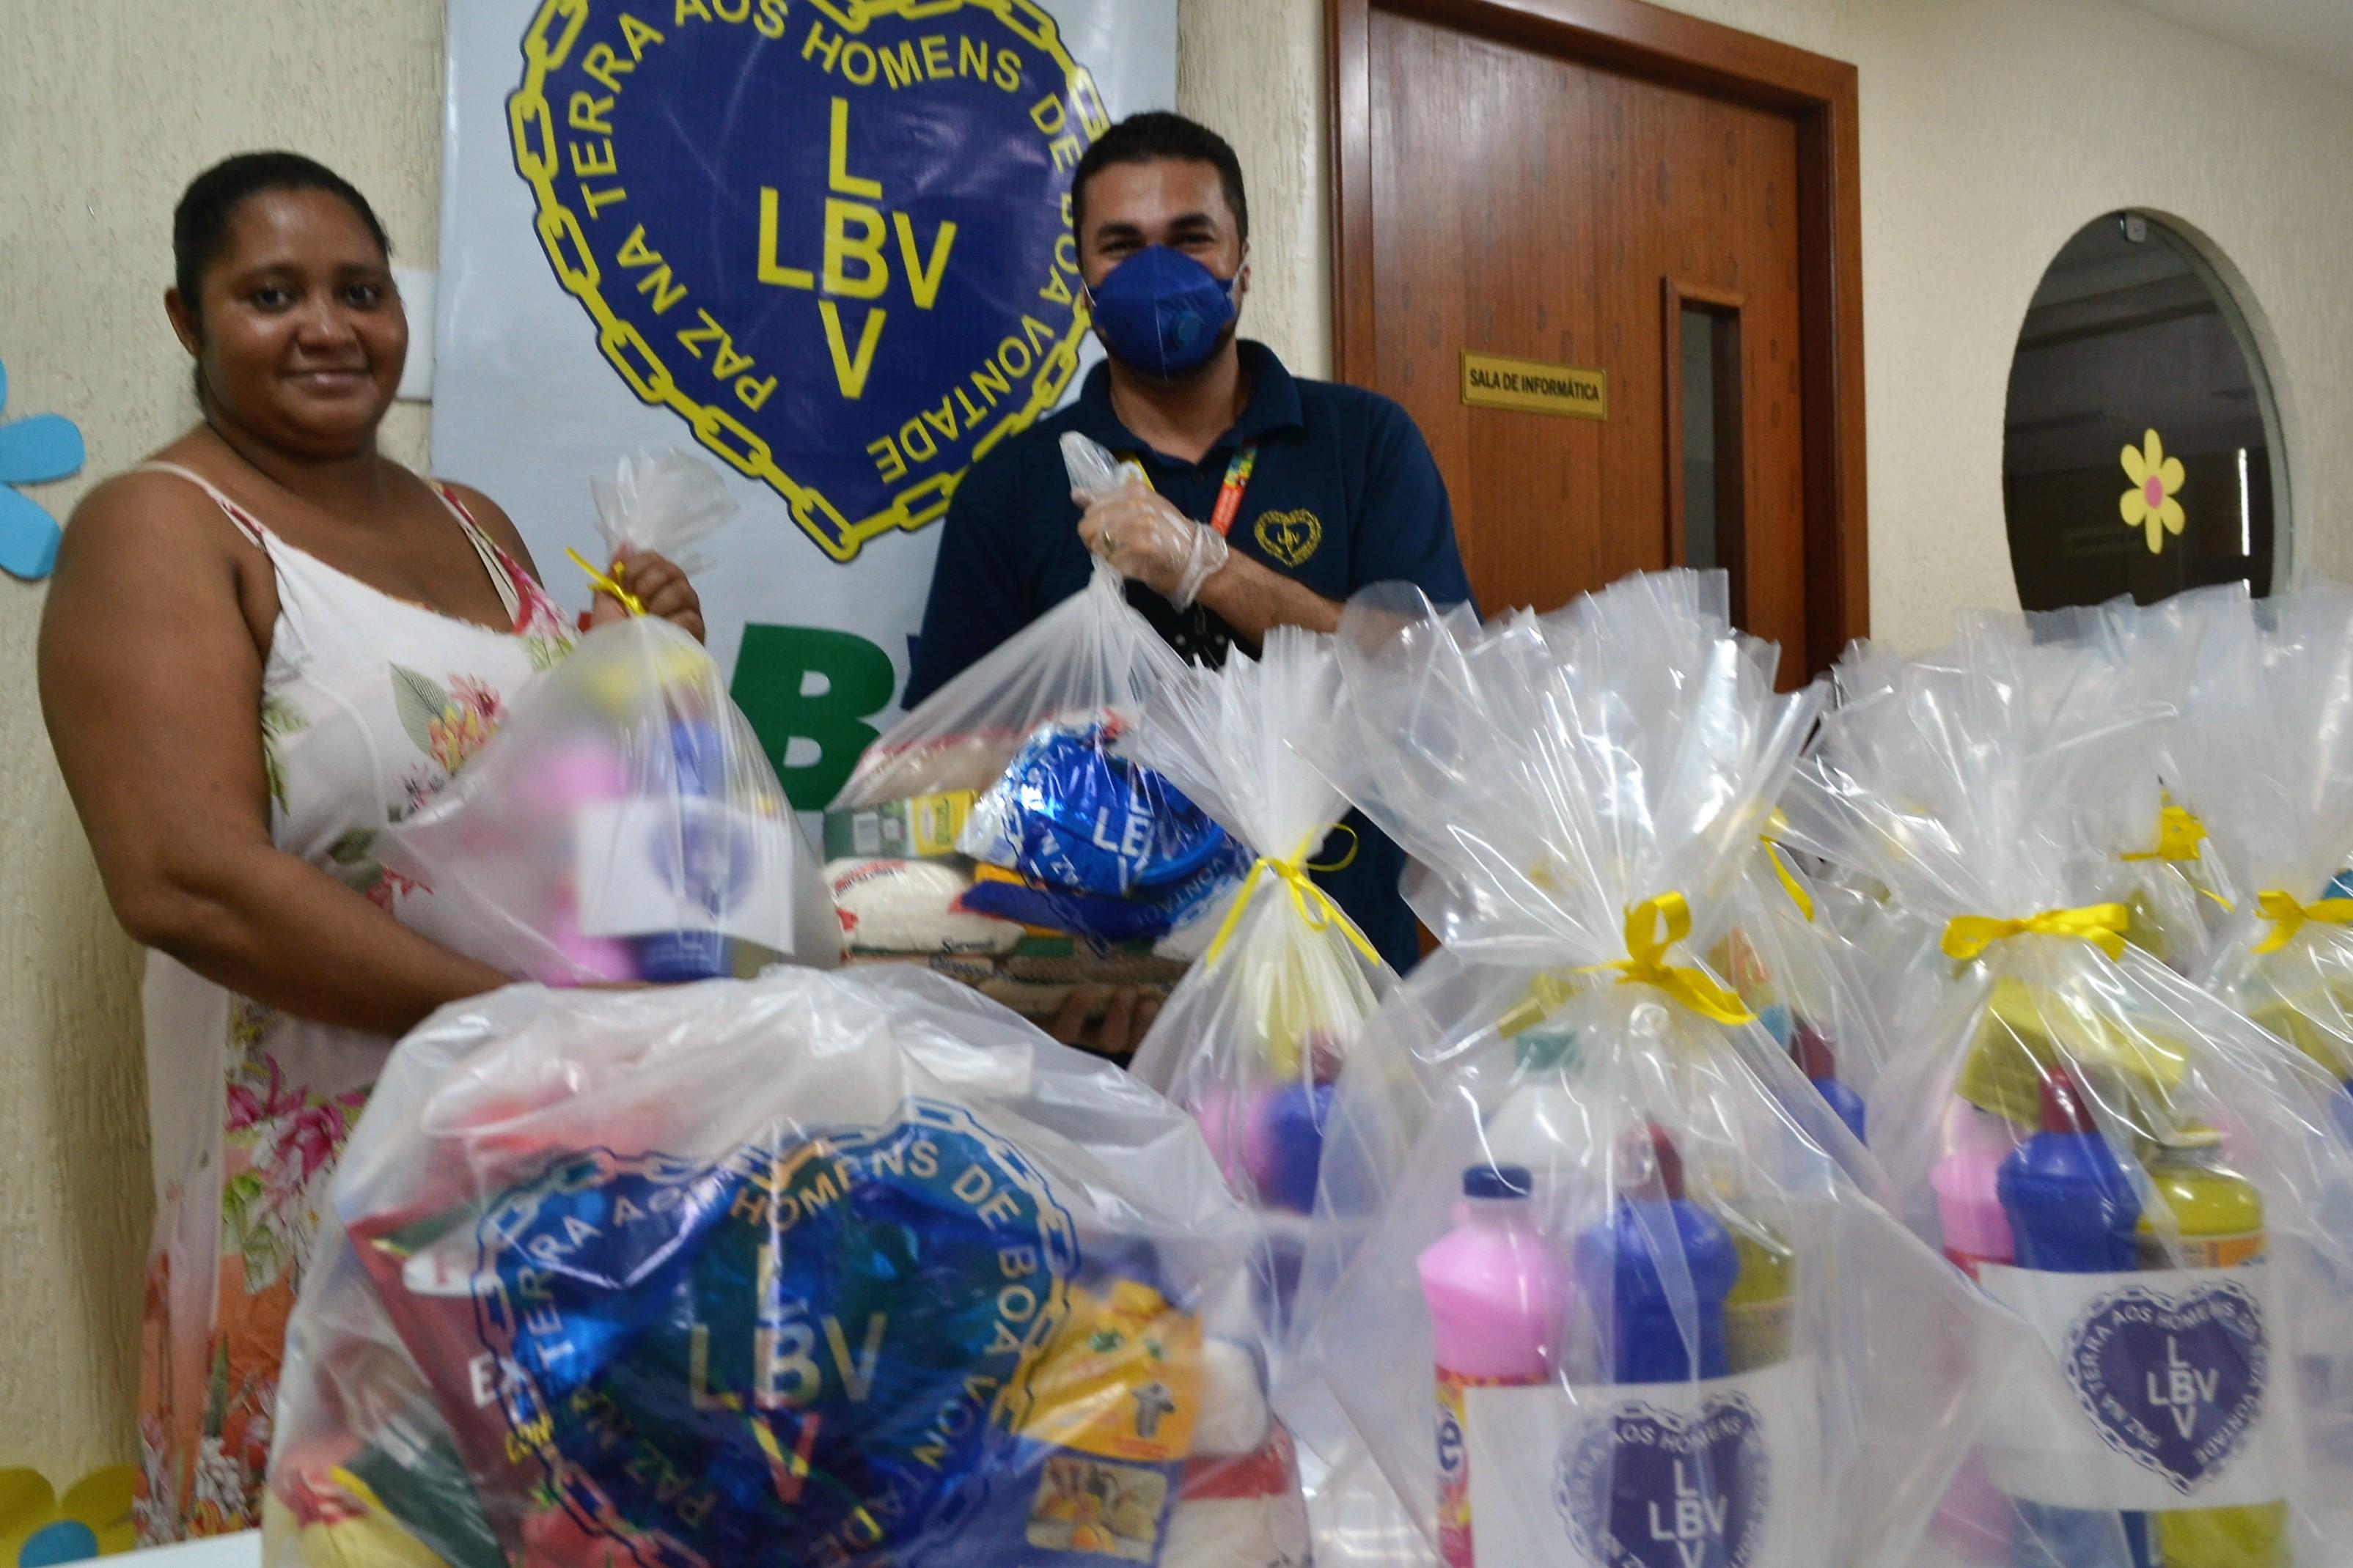 Os desafios das famílias brasileiras: Covid-19 e fome